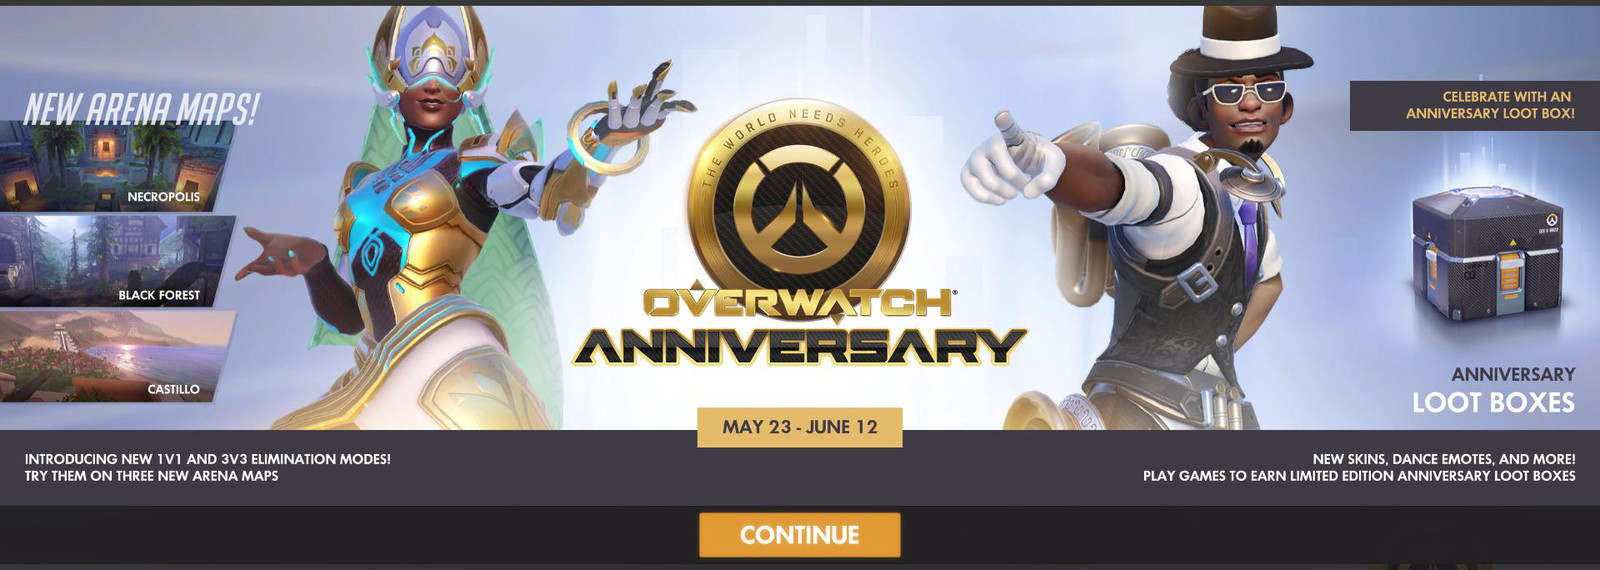 Overwatch 1 Year Anniversary — Oasis Symmetra Event Screen